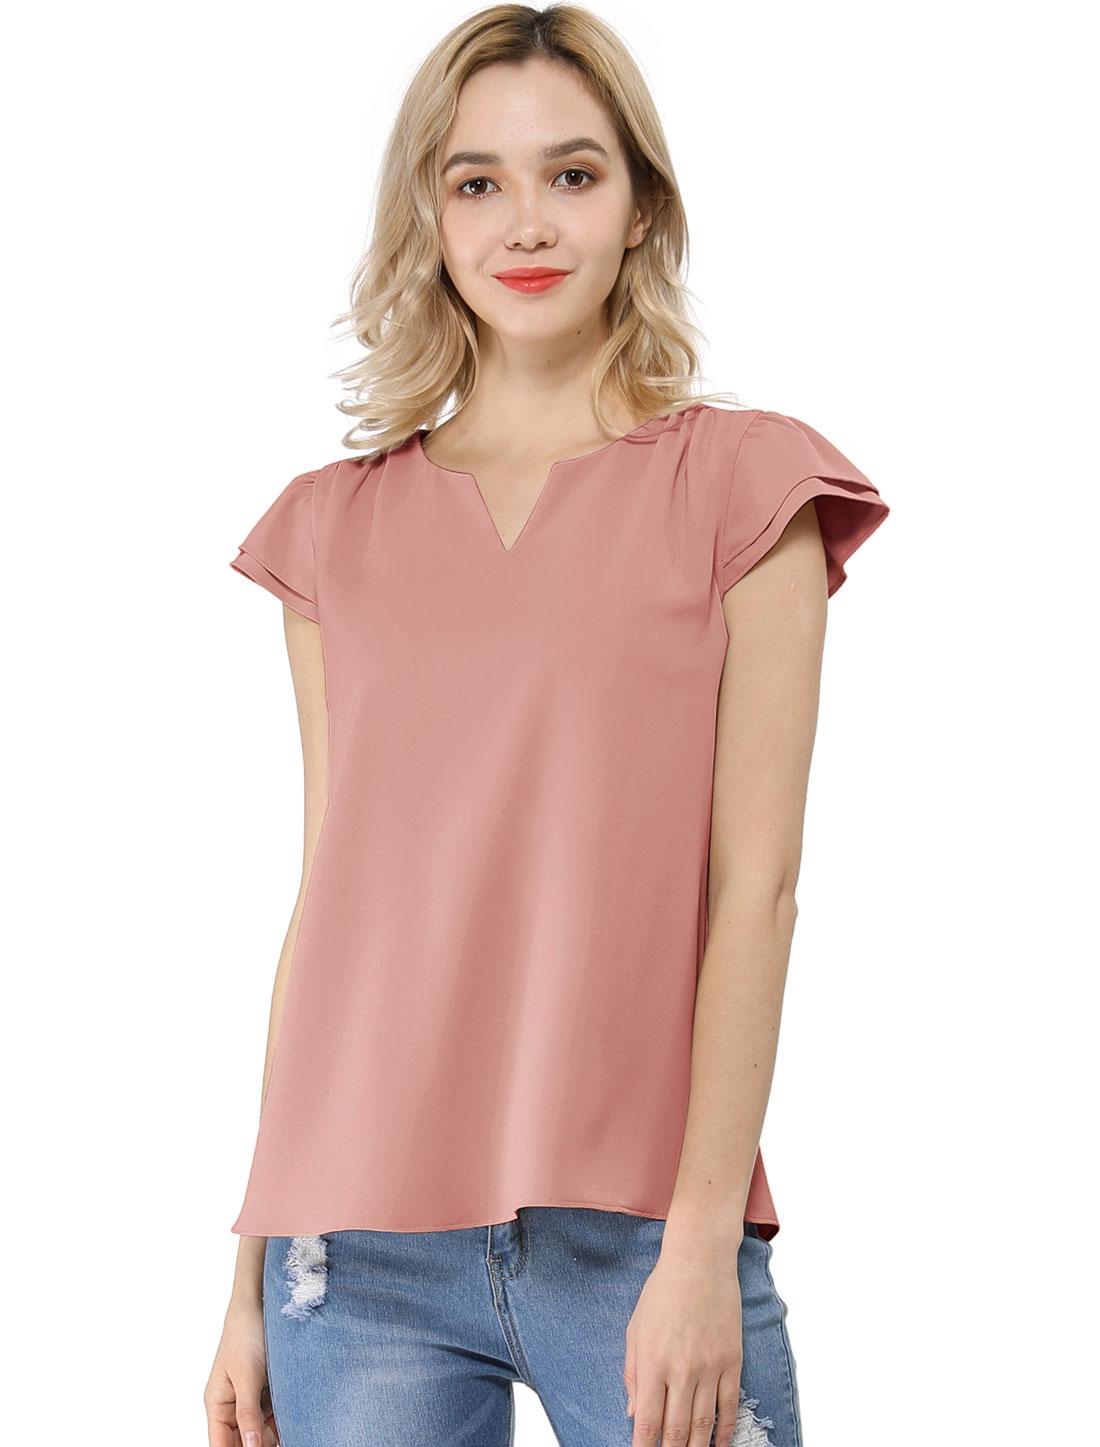 Allegra K Women's Work Business Casual Cap Sleeve Blouse Pink S